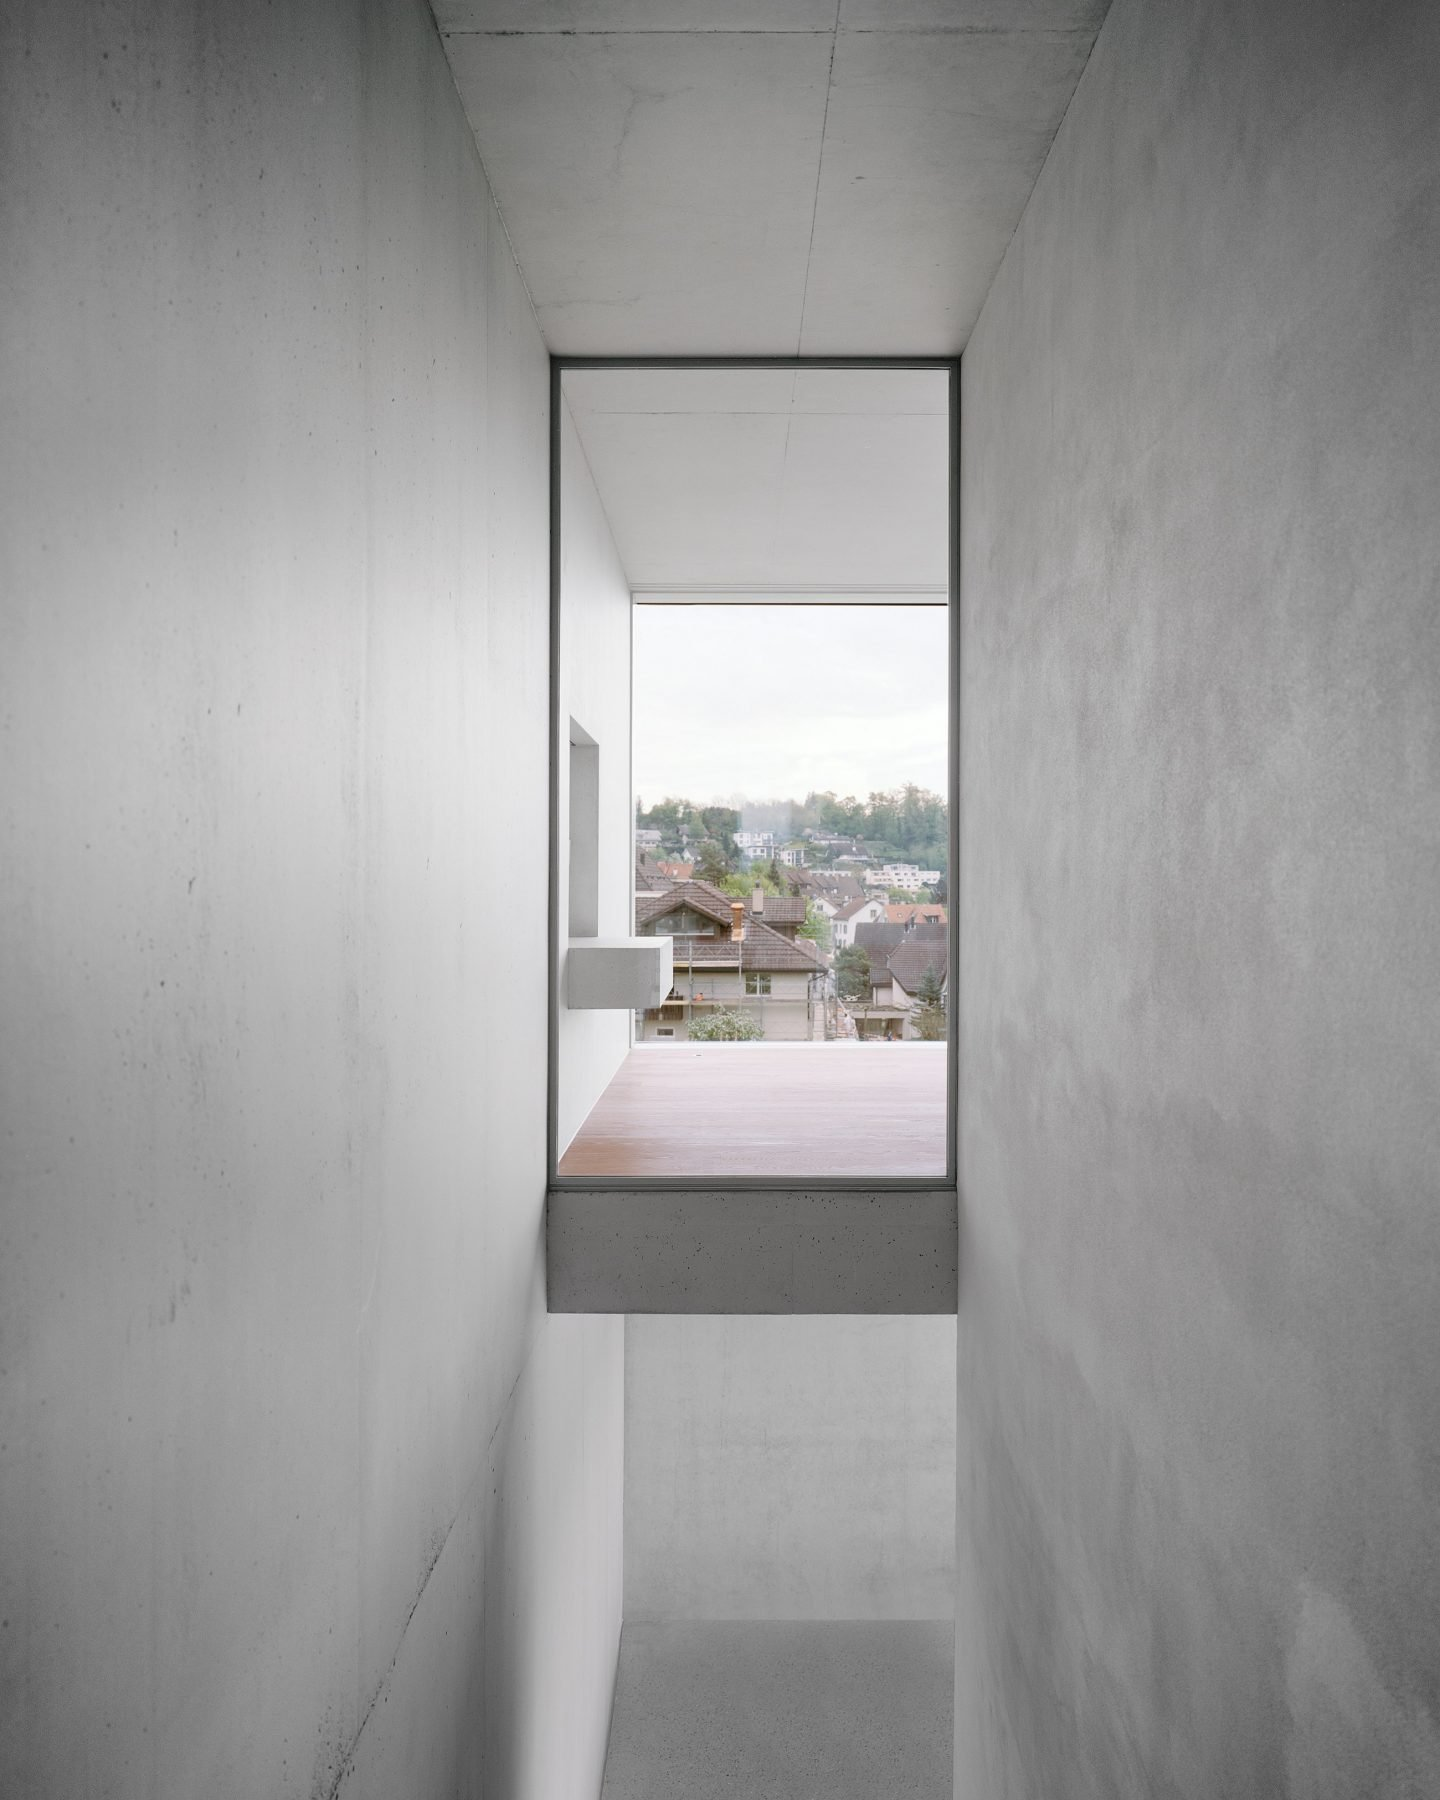 IGNANT-Architeecture-HouseB-6-min